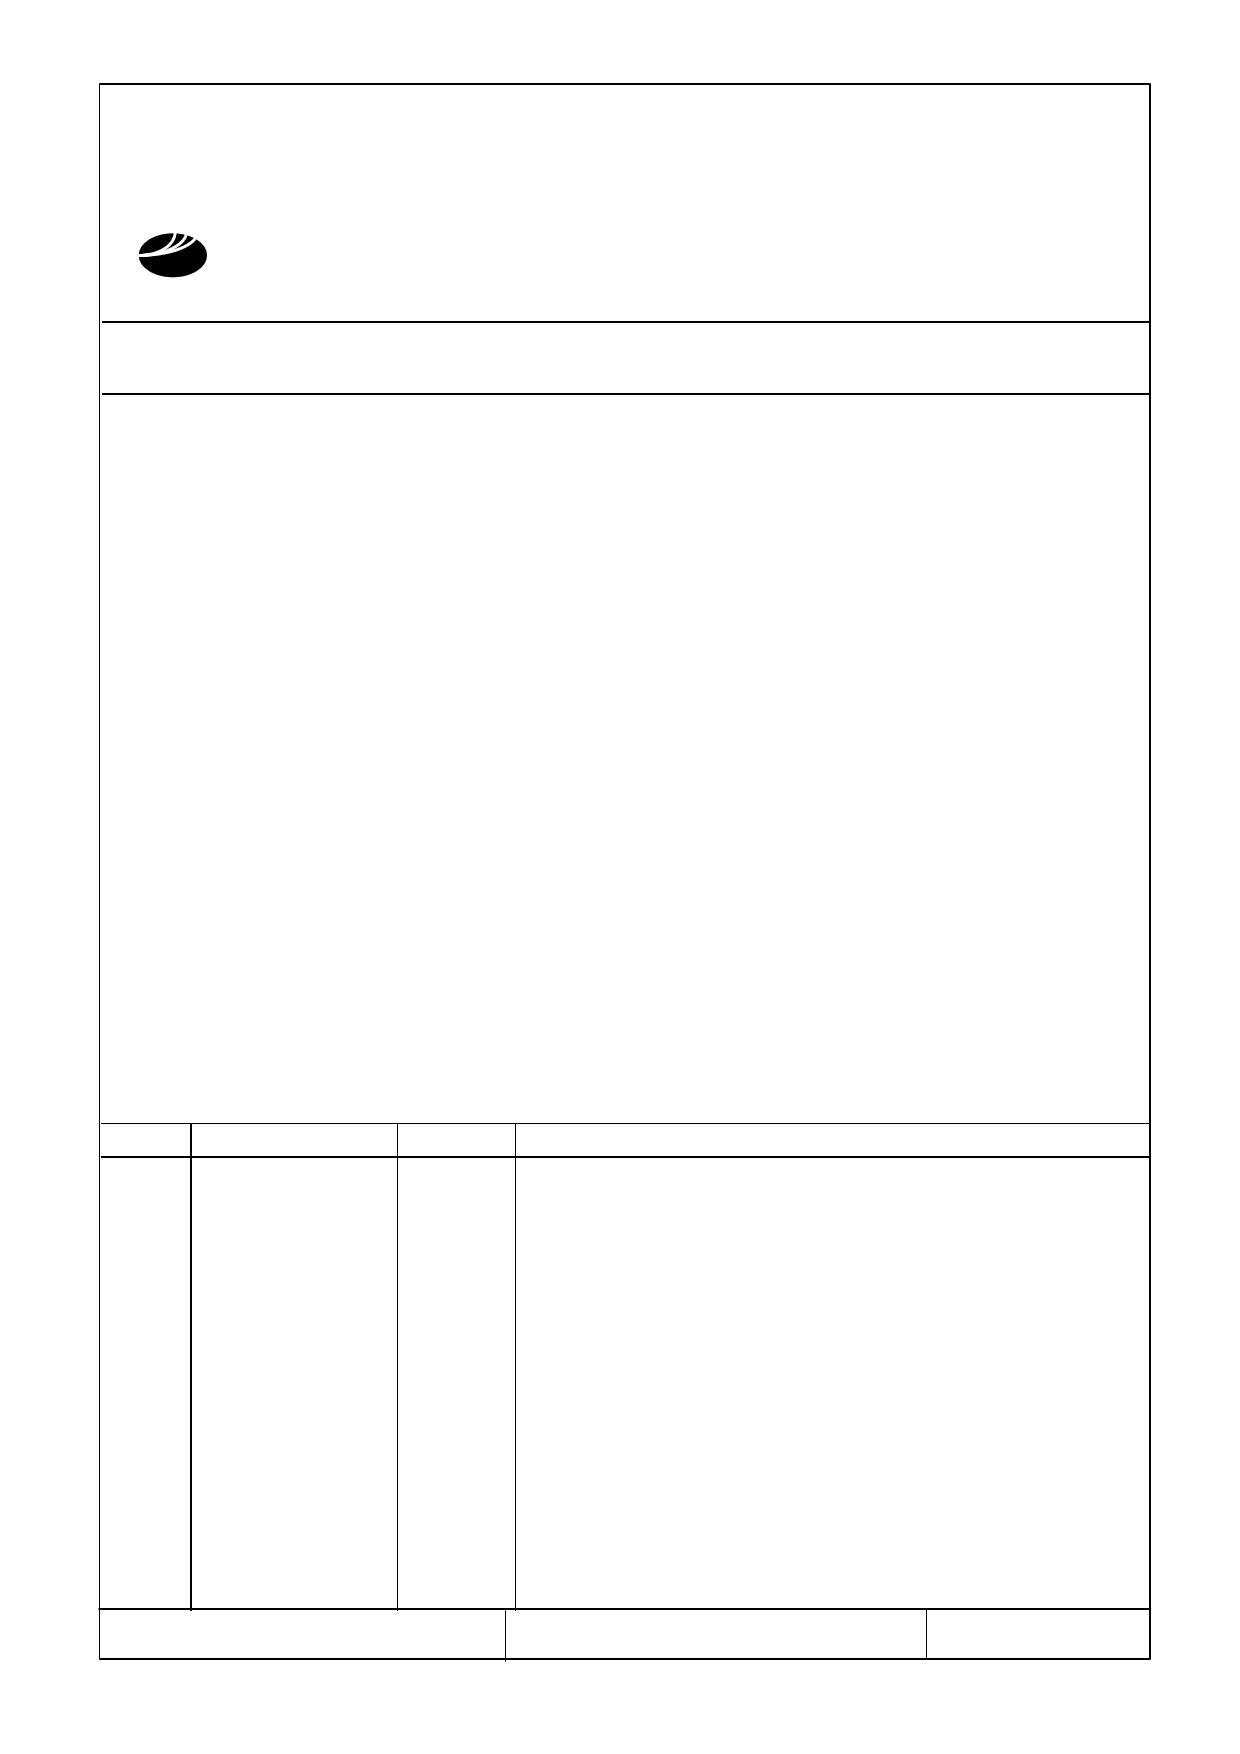 T-51639D084U-FW-A-AA datasheet